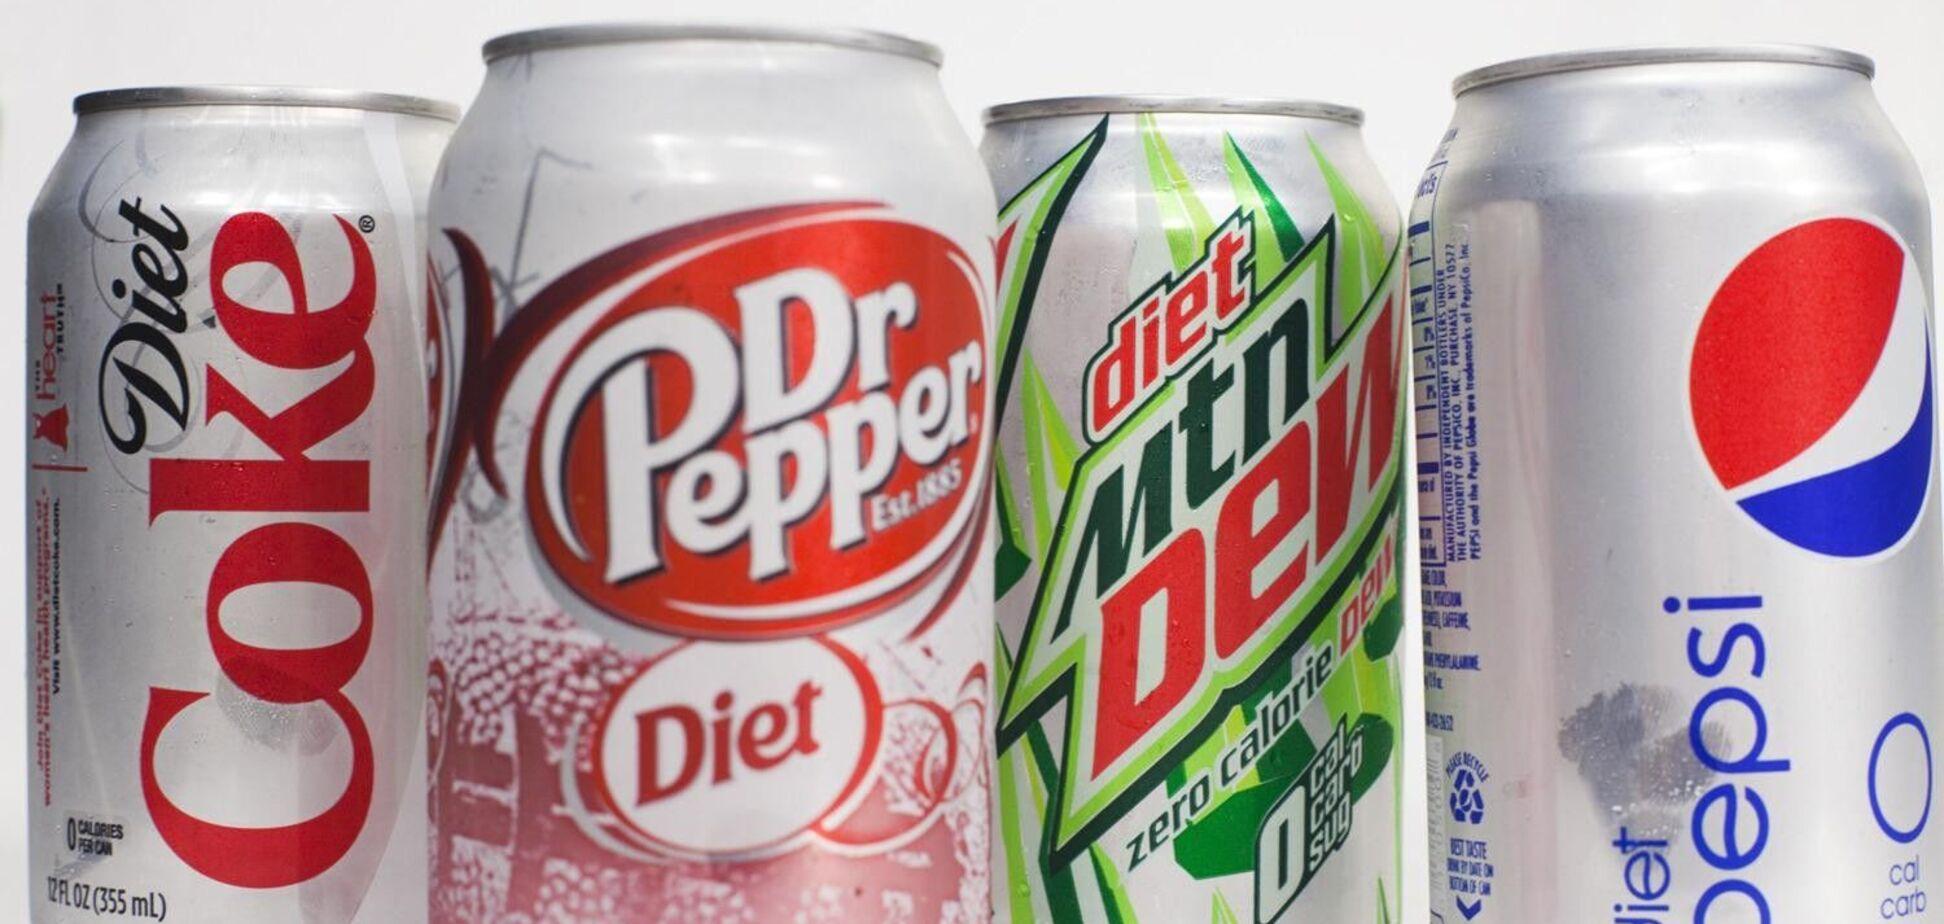 'Диетические' напитки без сахара увеличивают риск заболеваний сердца – исследование